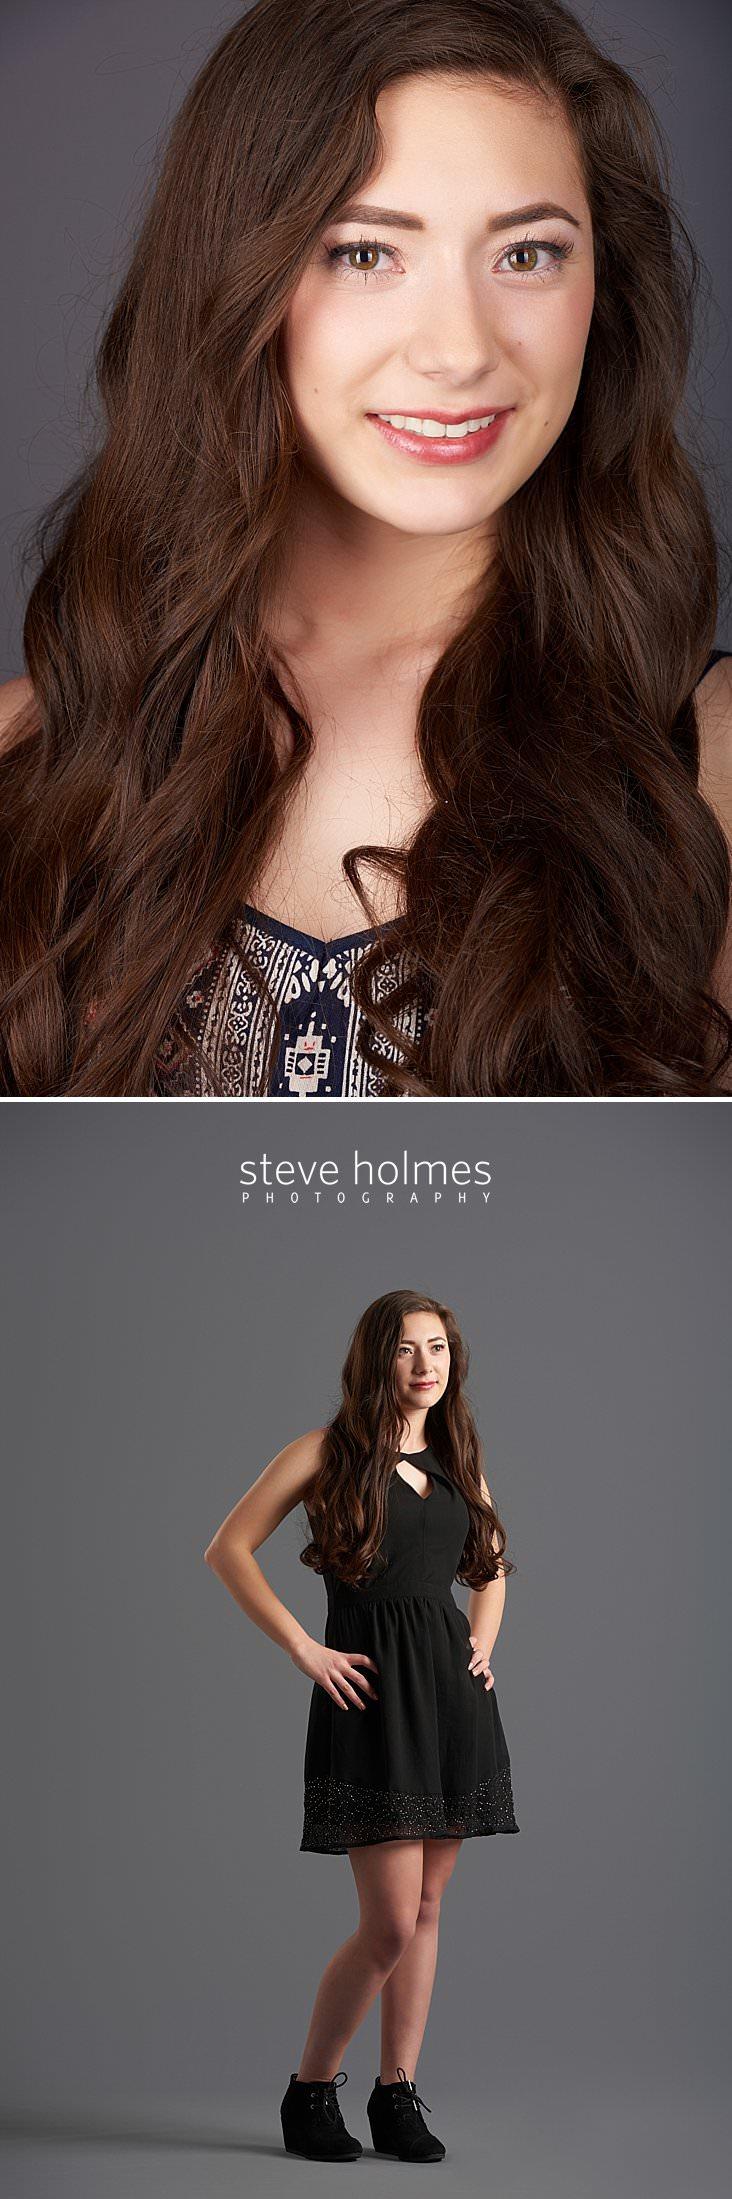 05_Close up studio senior portrait of teen girl with brown hair and brown eyes.jpg